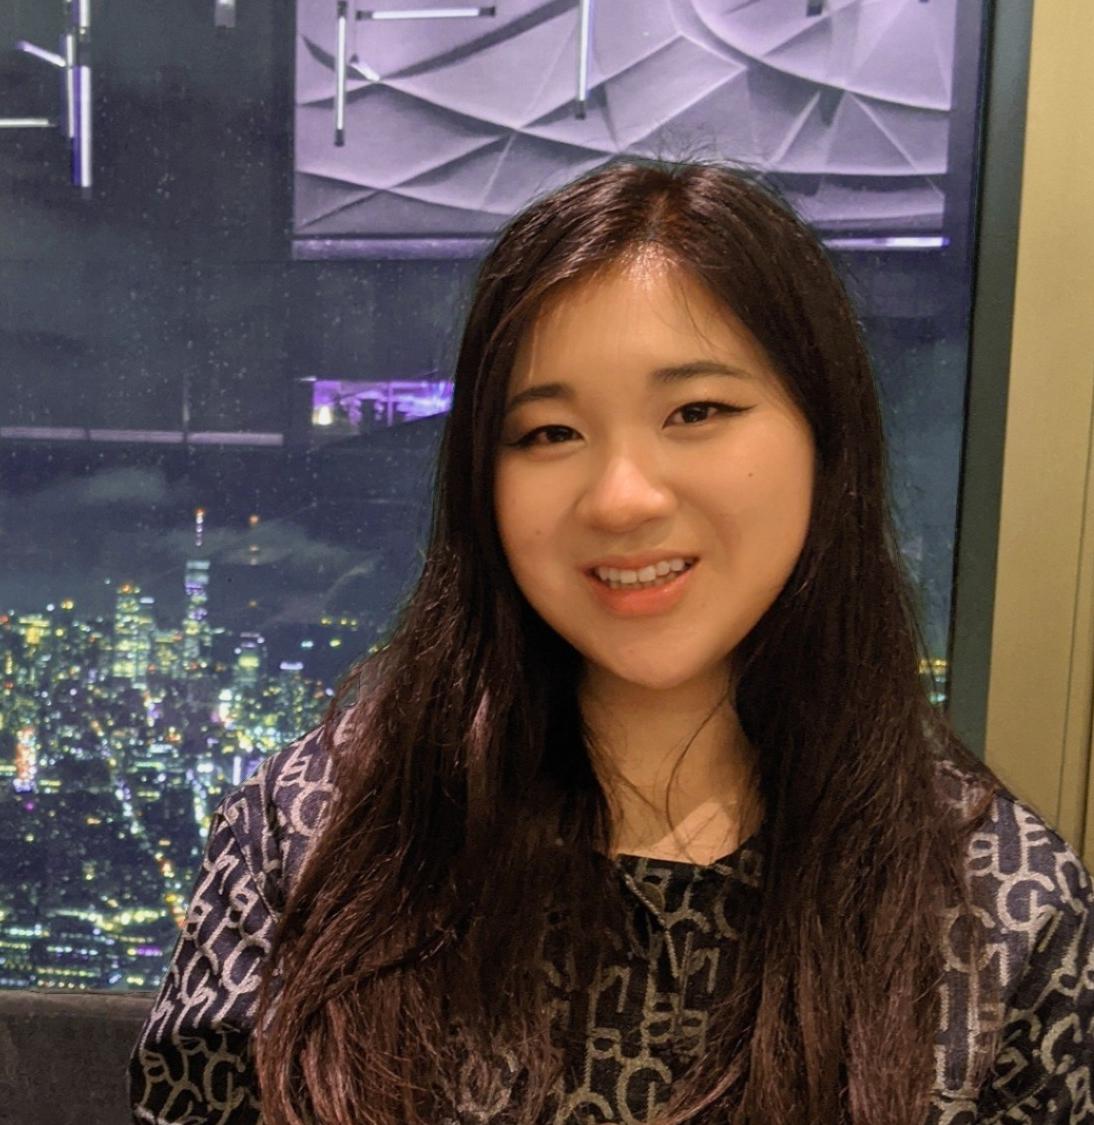 Mayee Chen